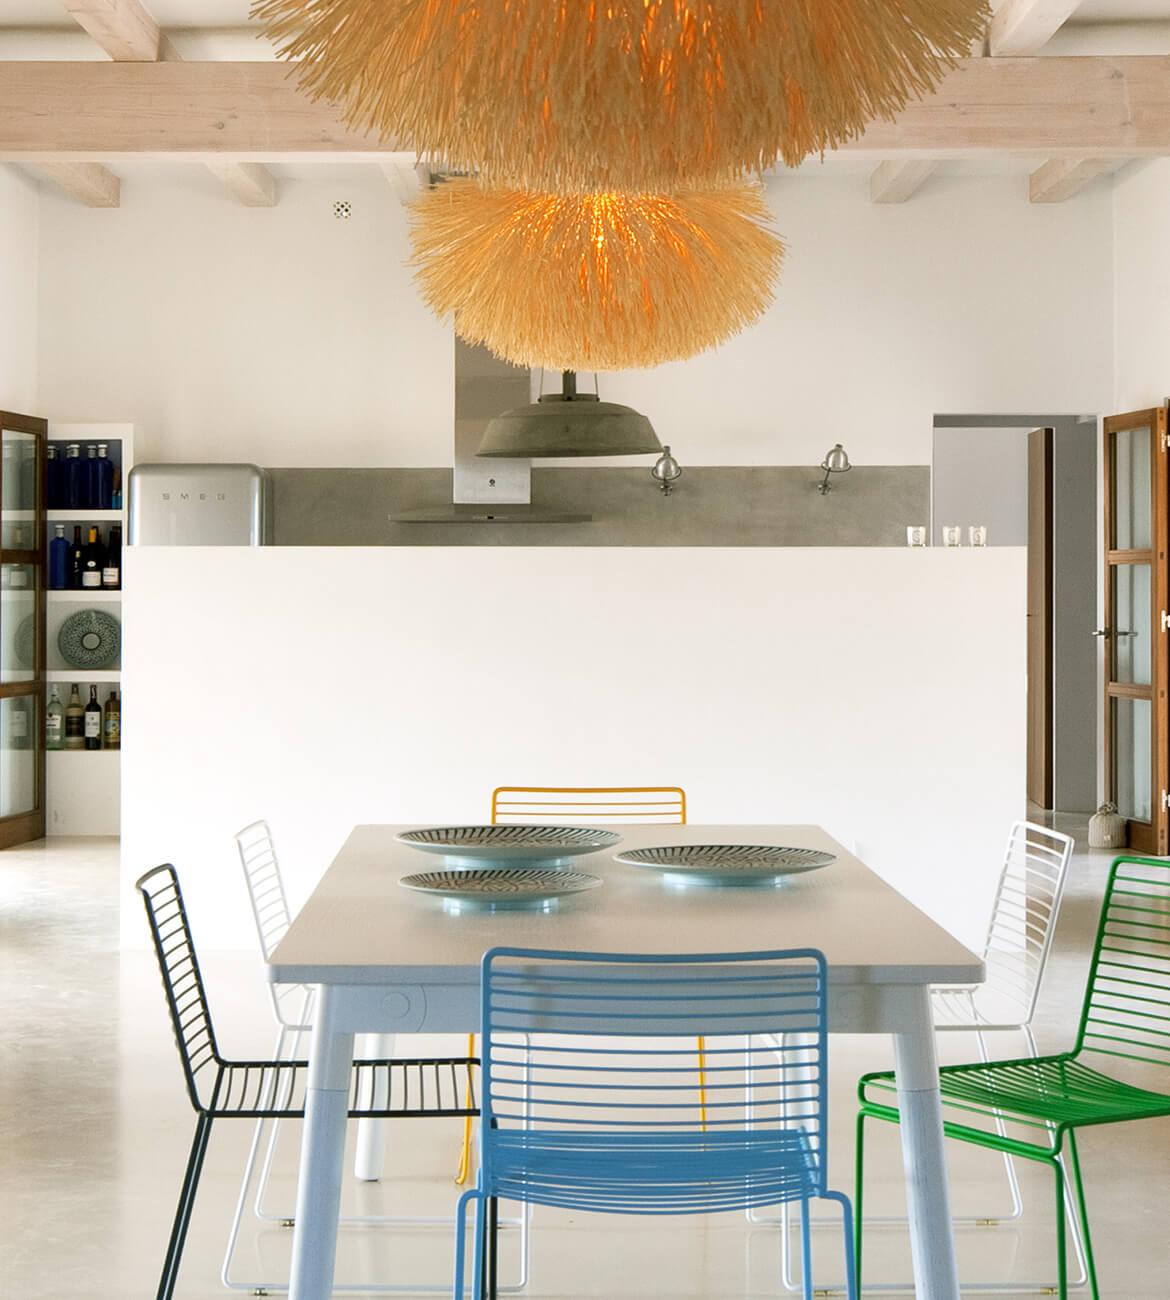 proyecto de interiorísmo Catalina House para casa Pep Lluqui. Comedor lámpara rafia